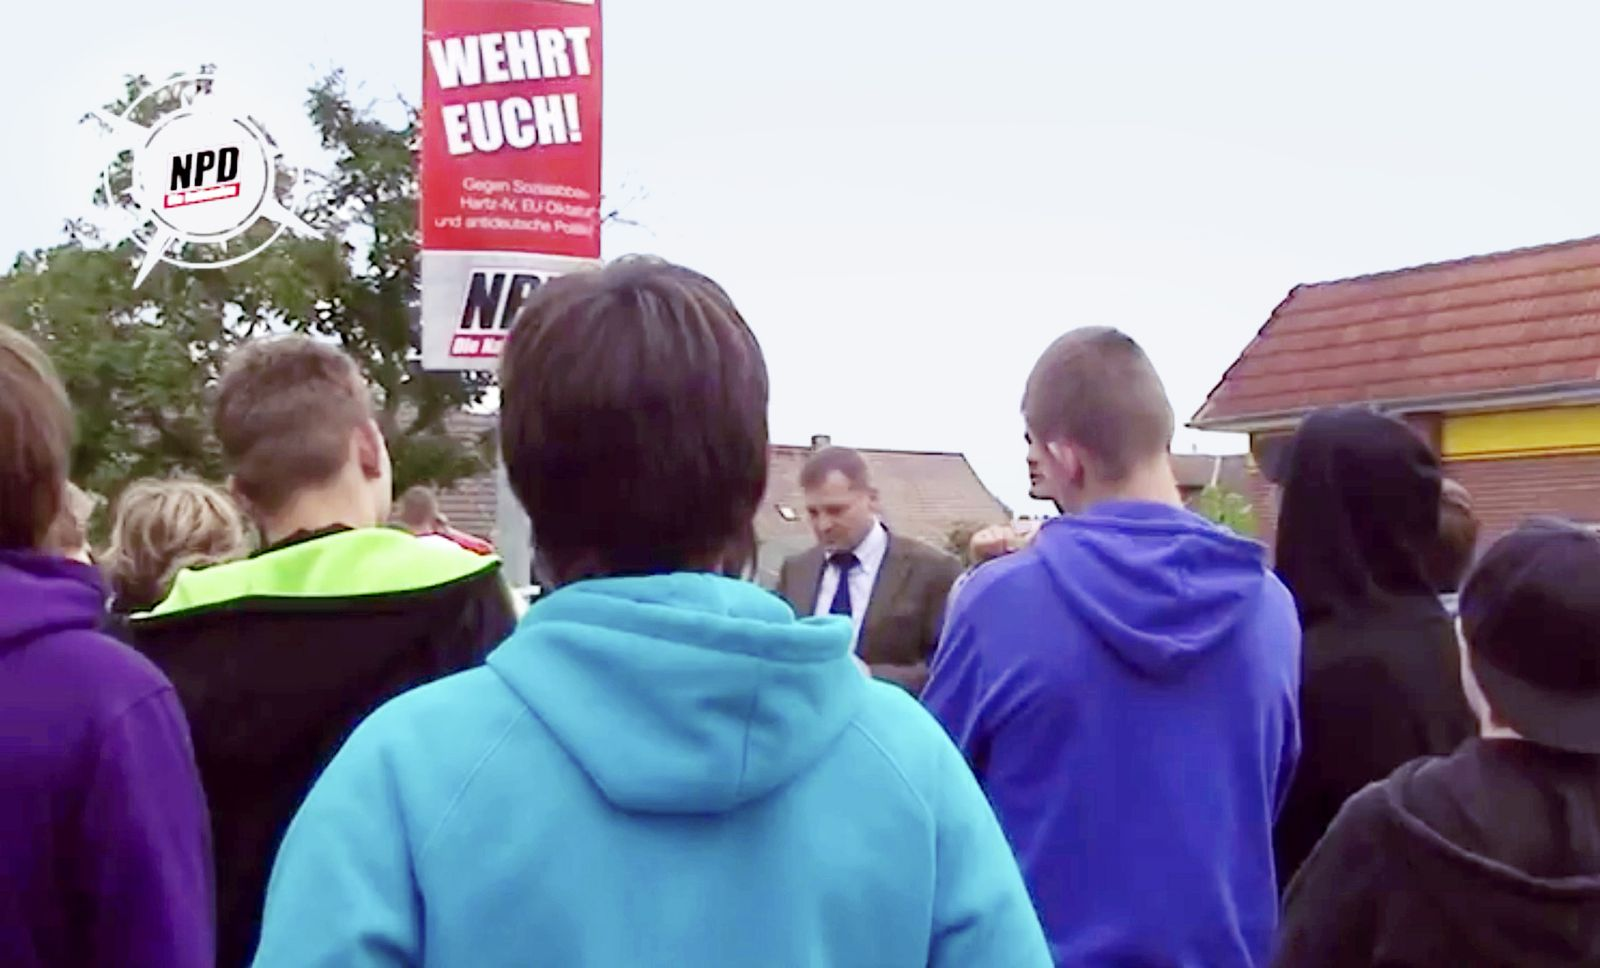 NUR ALS ZITAT NPD Wahlkampf/ Schulklasse